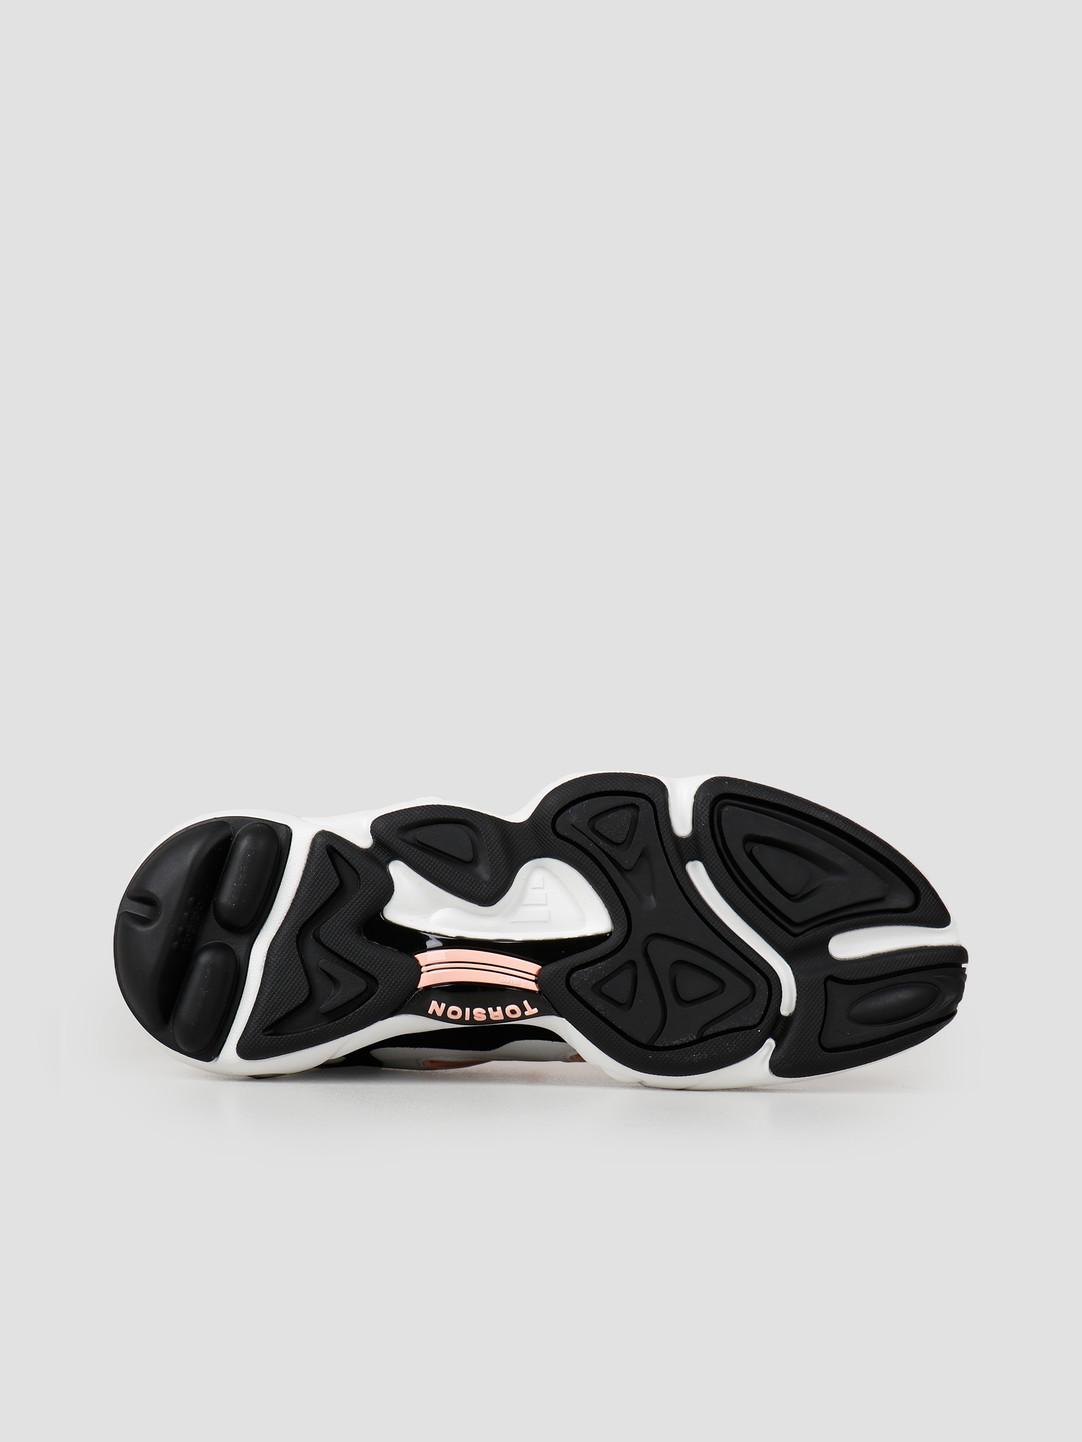 adidas adidas Fyw S-97 Crywht Cblack Cleora EF2044